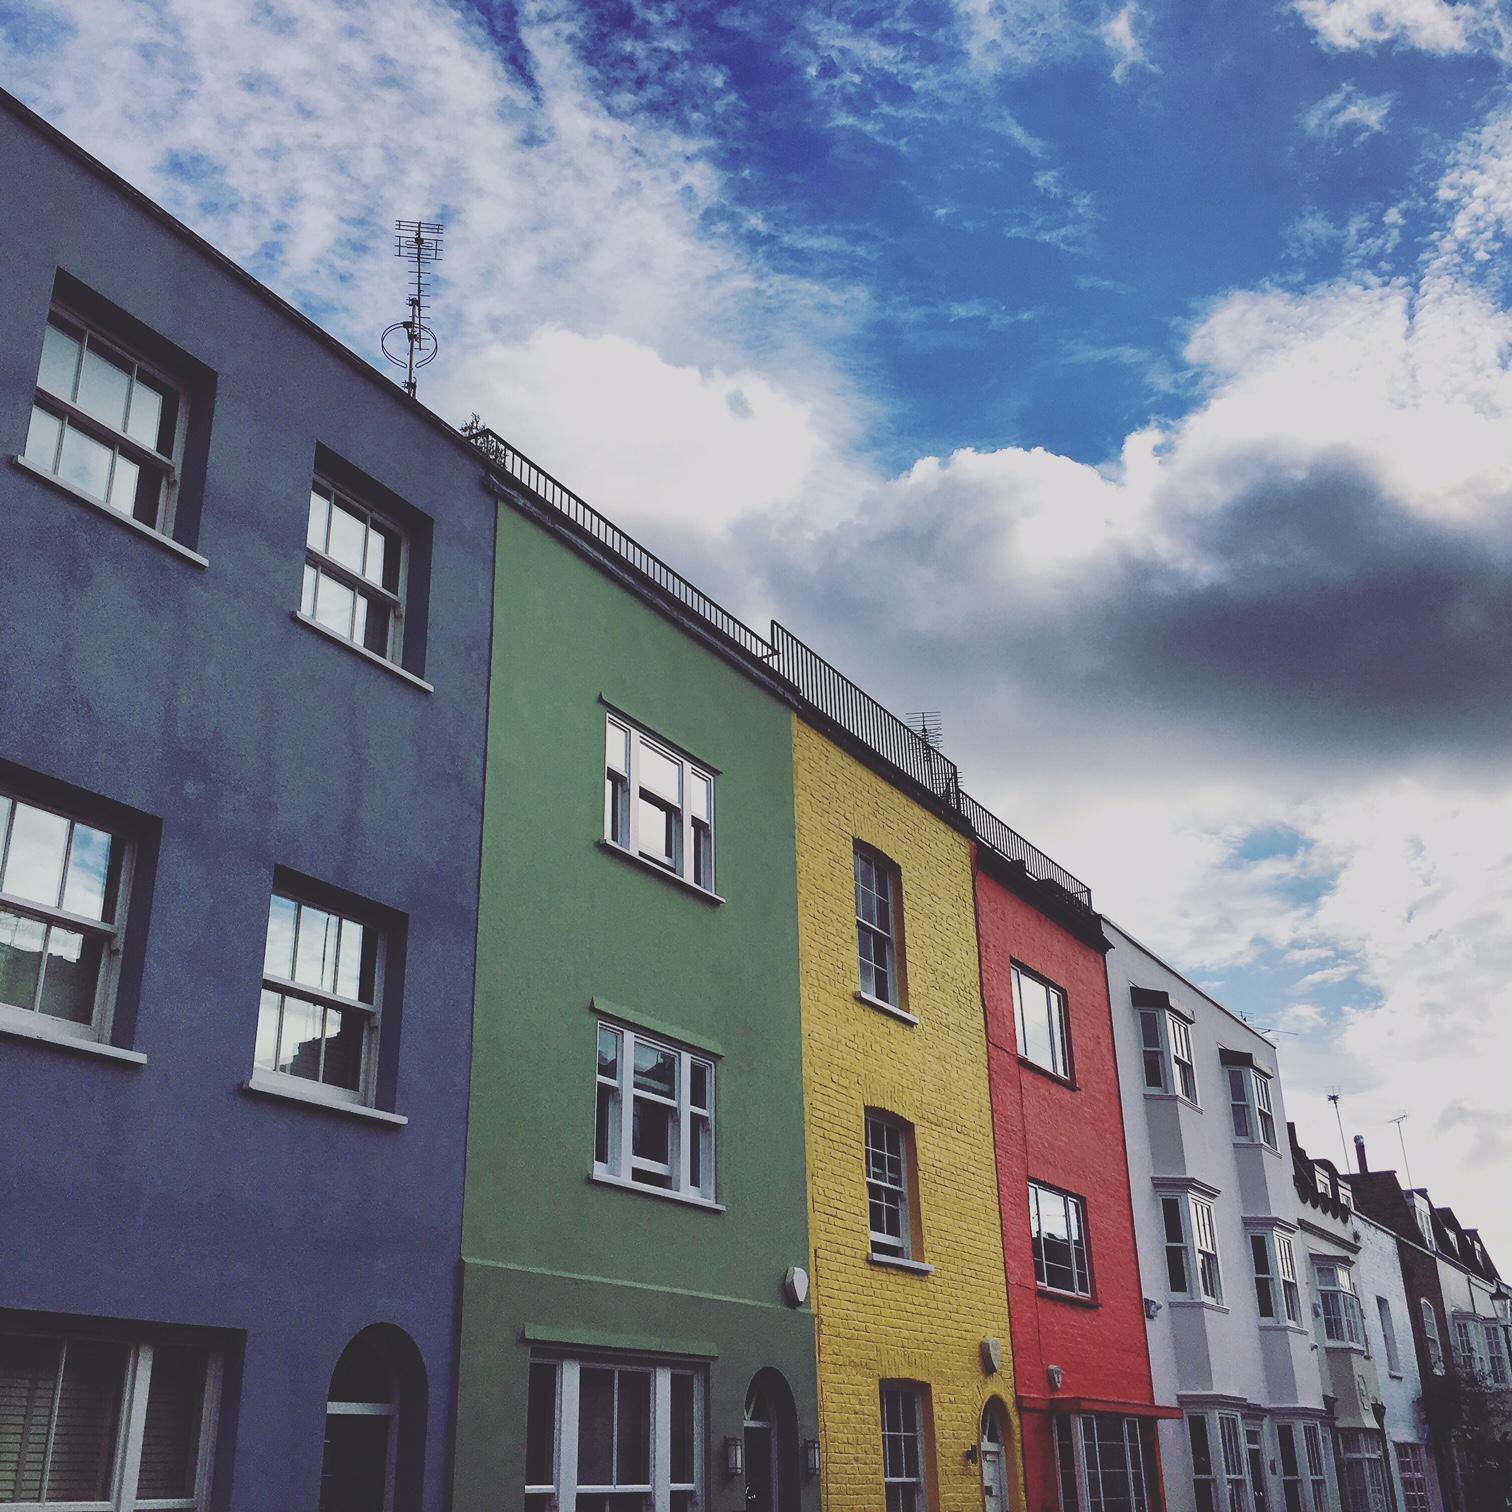 colourfulchelseahouses